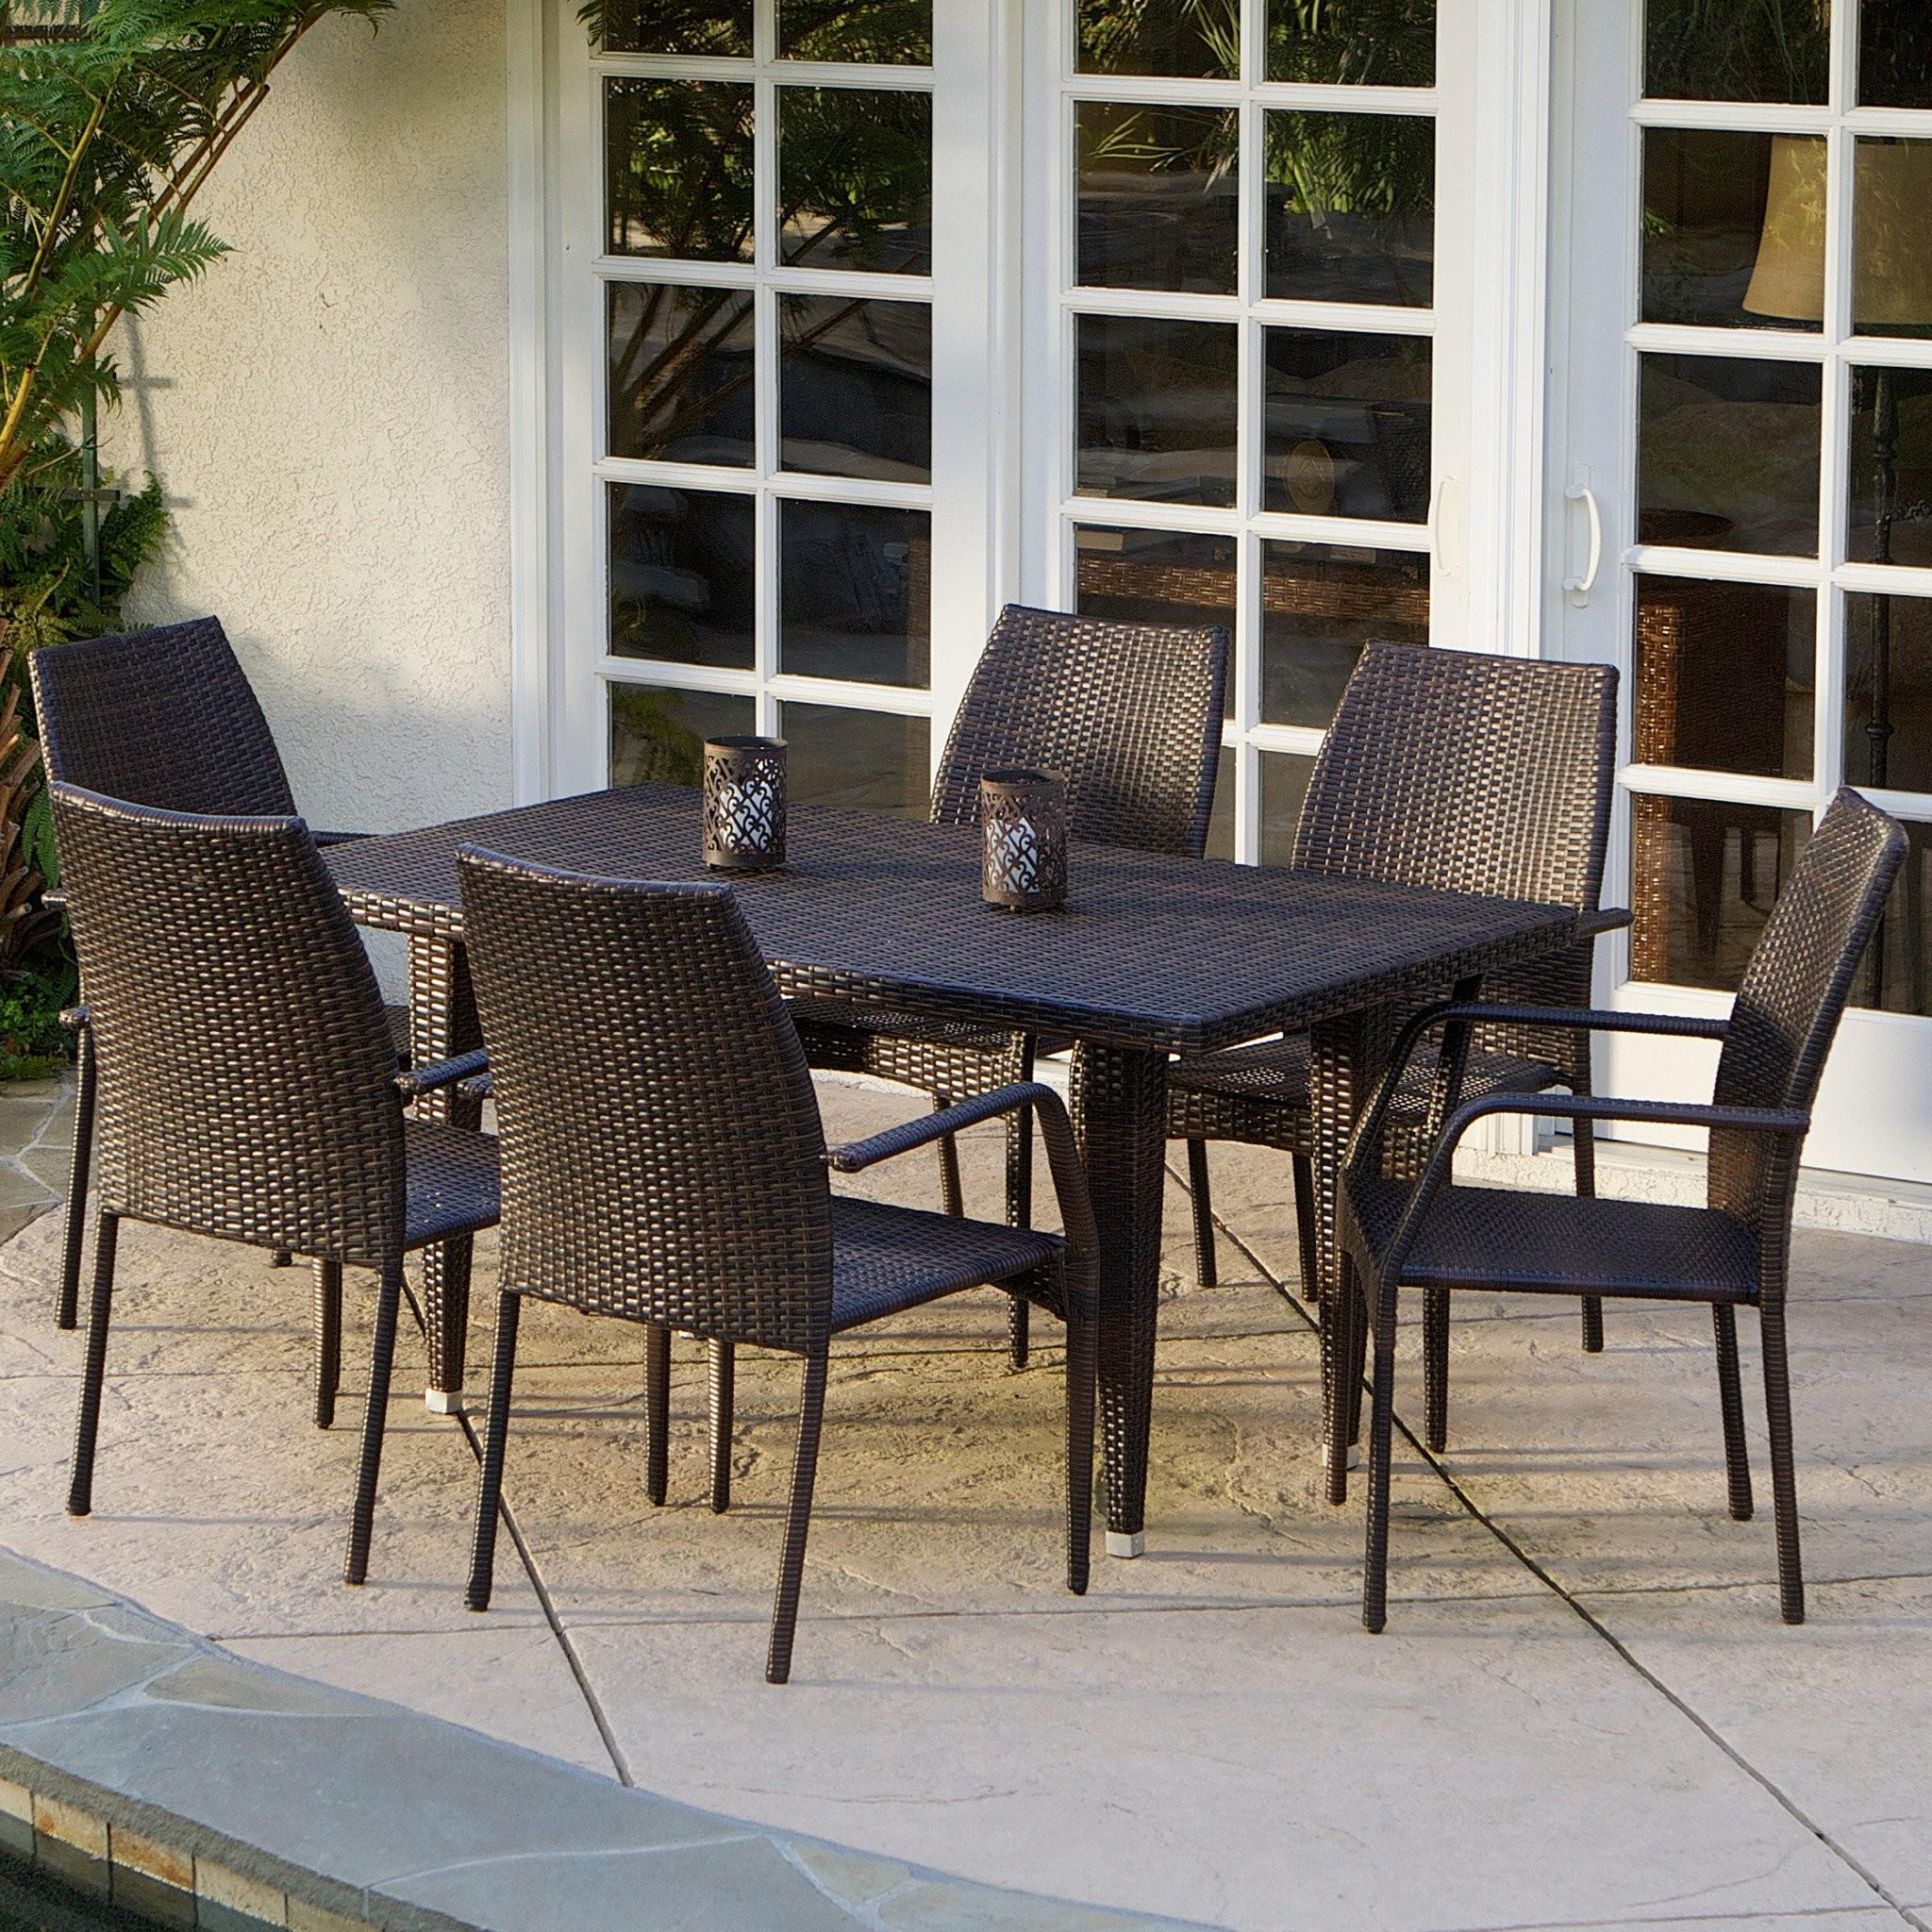 Michael 7-Piece Outdoor Wicker Dining Set